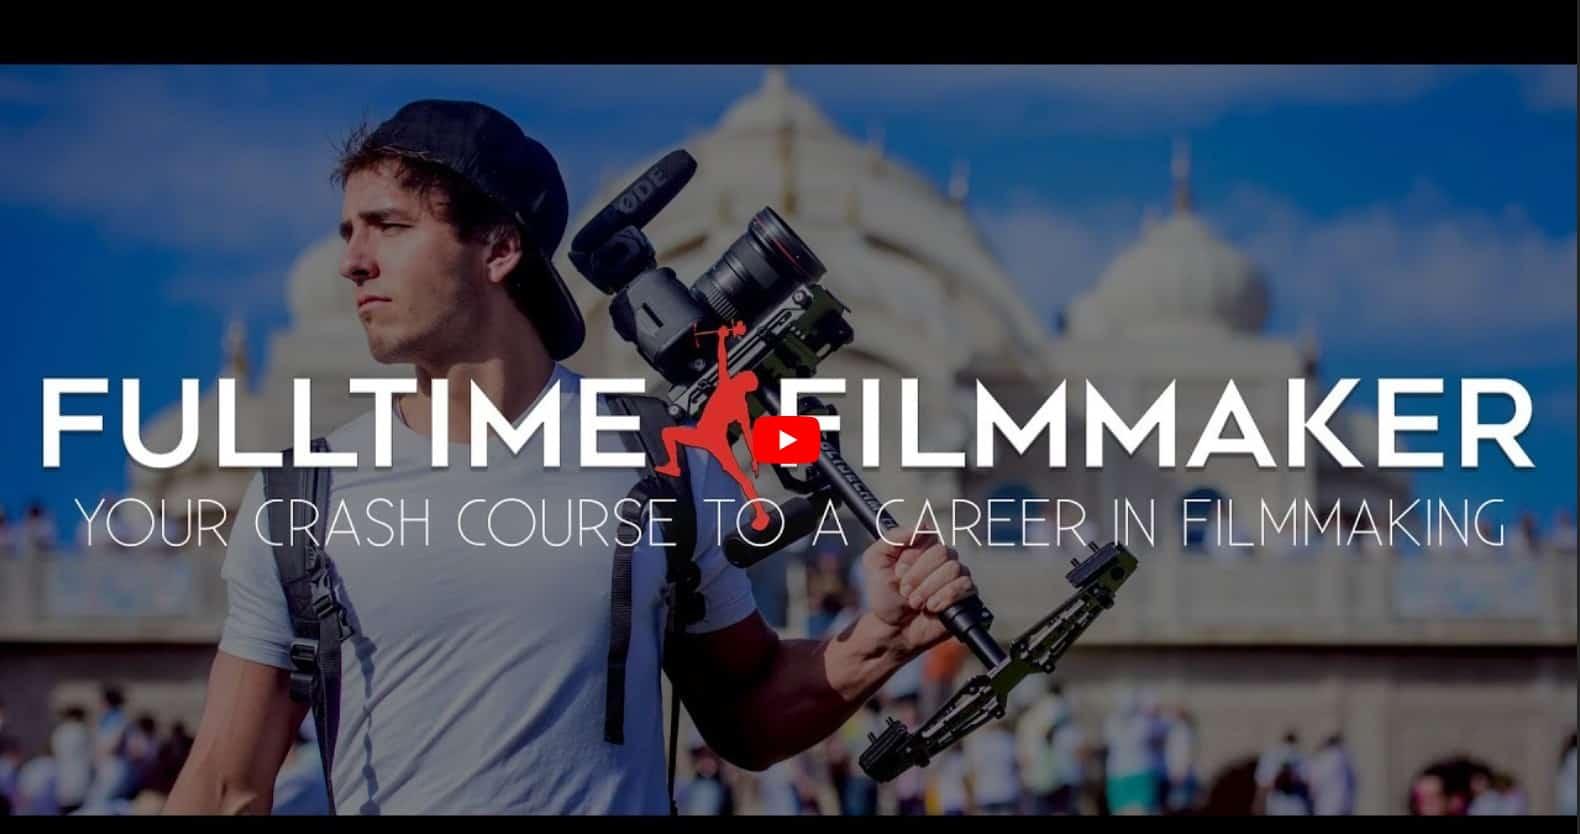 Full Time Filmmaker by Parker Walbeck 2018